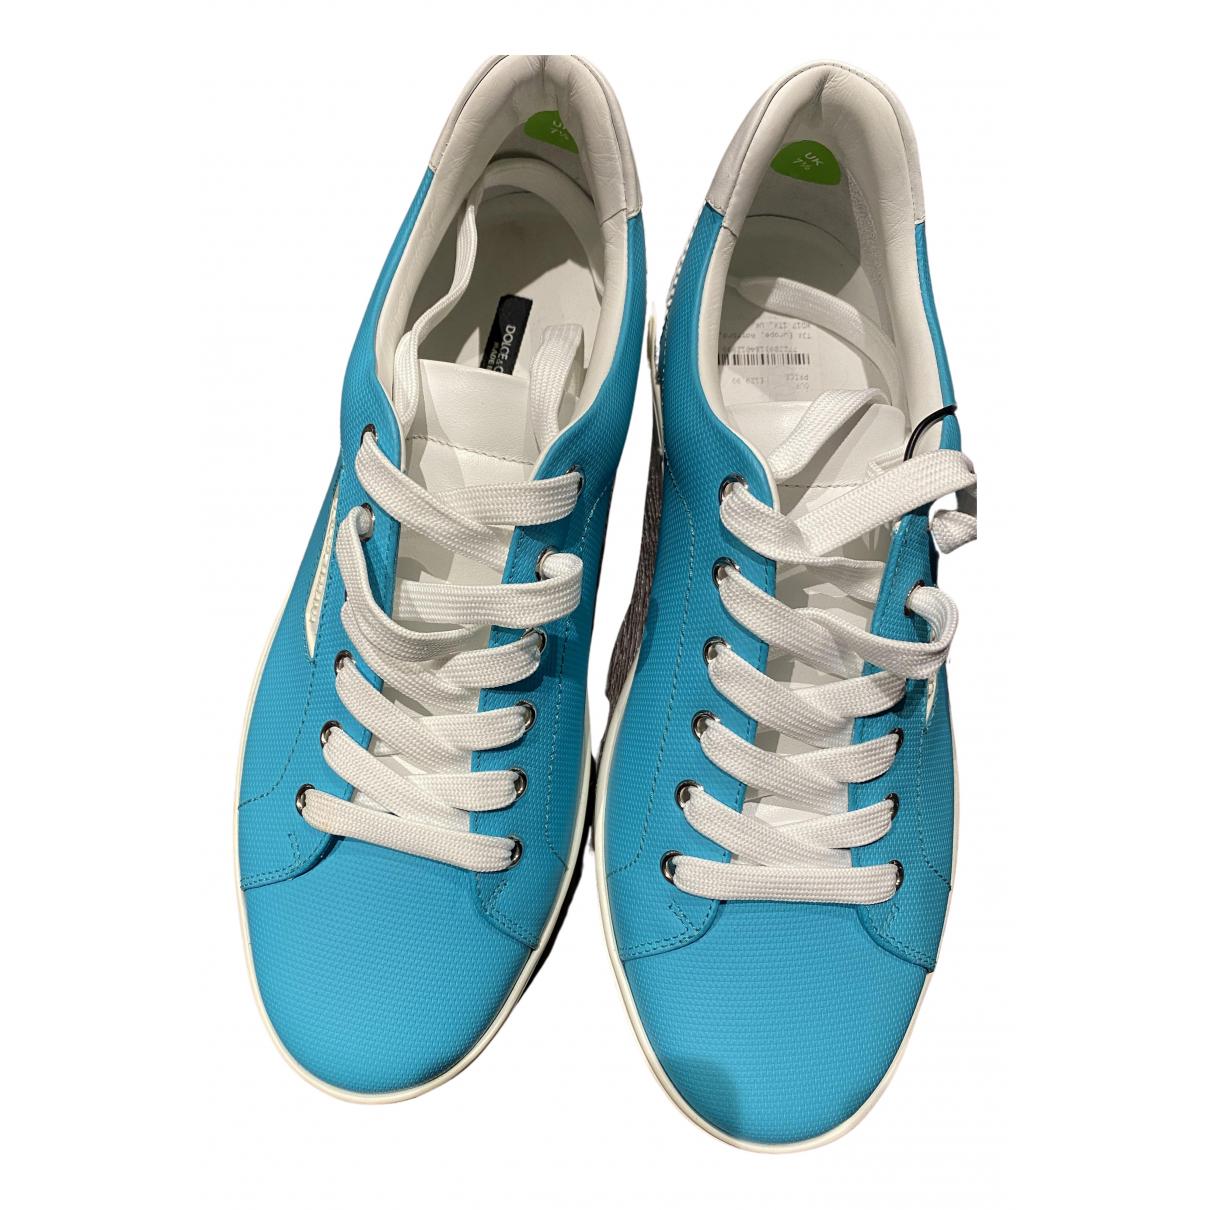 Dolce & Gabbana \N Sneakers in  Tuerkis Leder